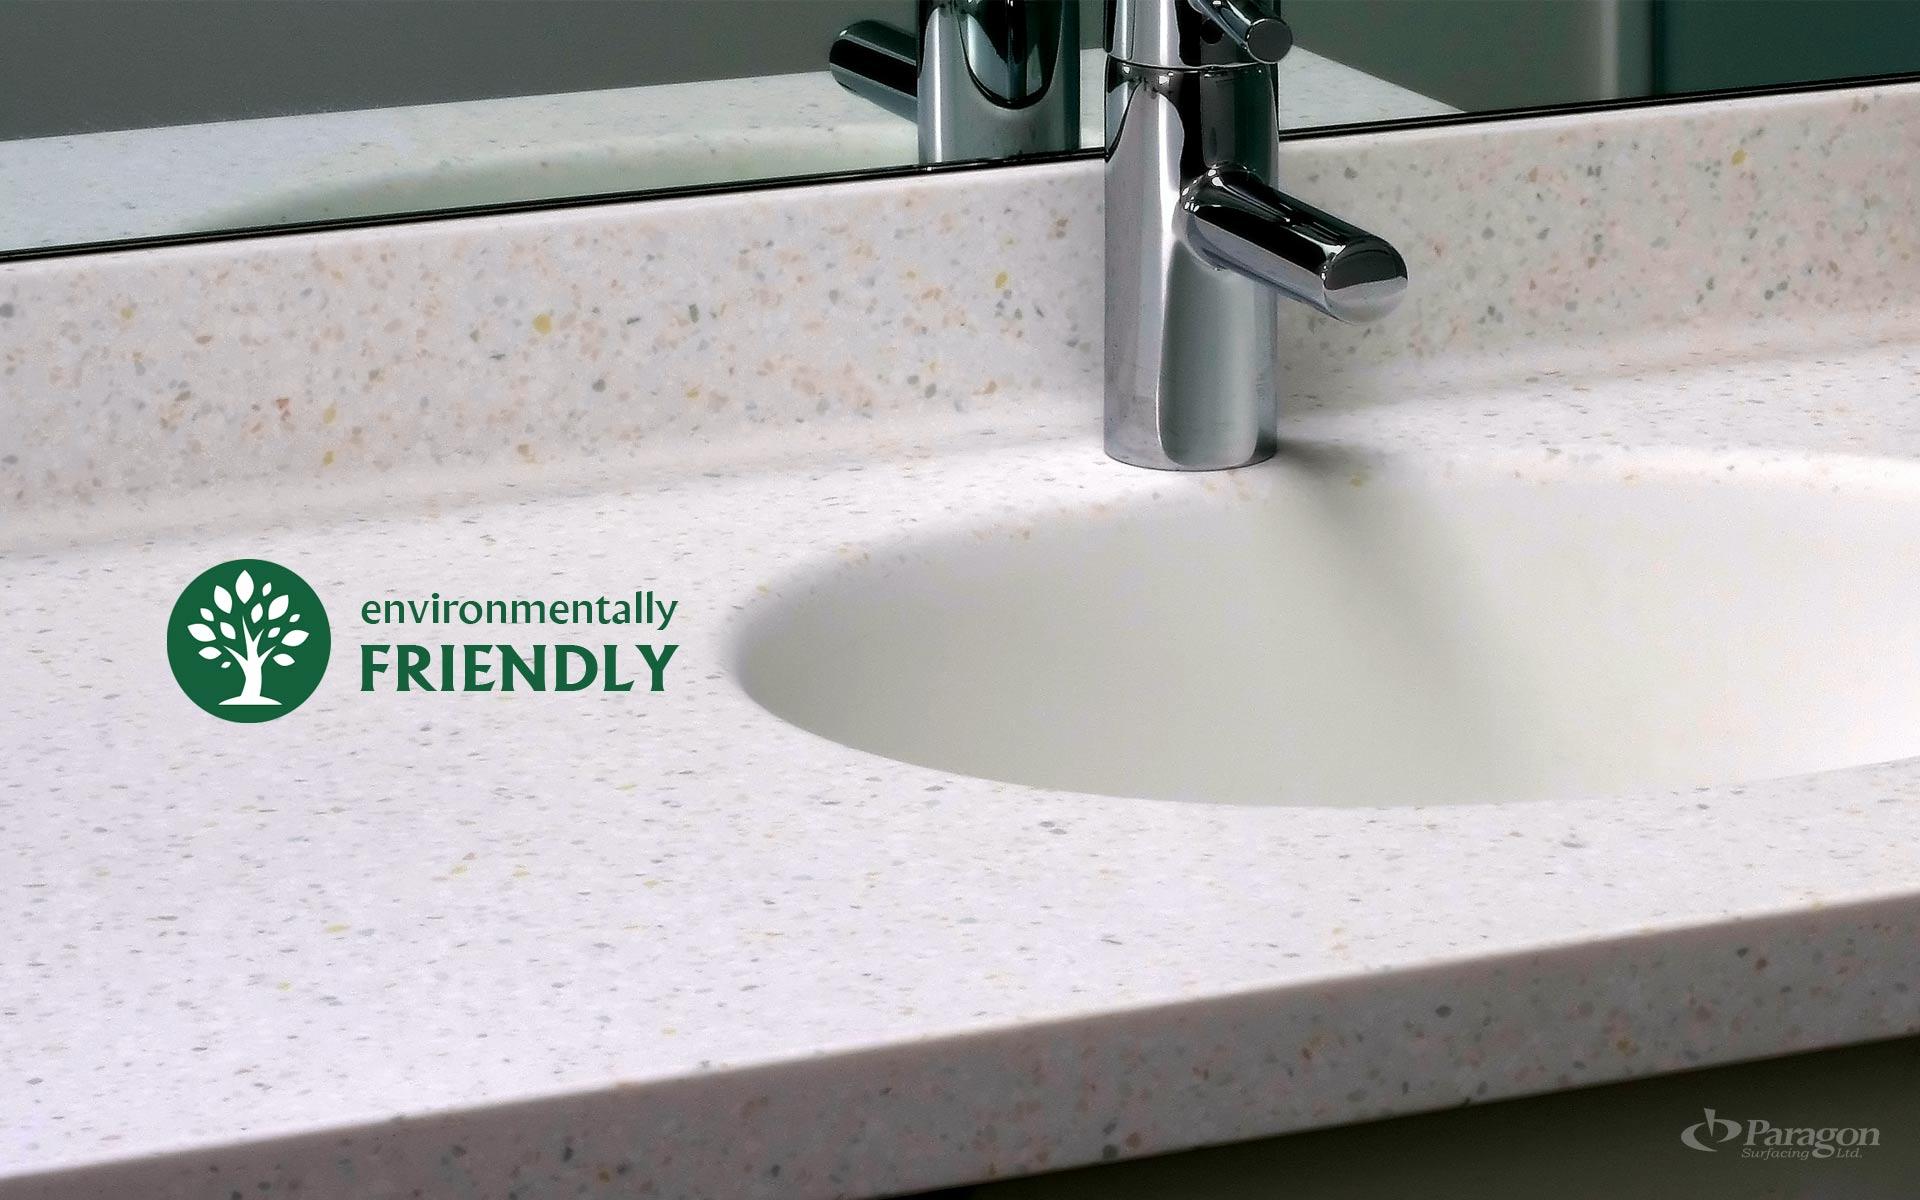 Ordinaire Home / Countertops / Green Eco Friendly Countertops